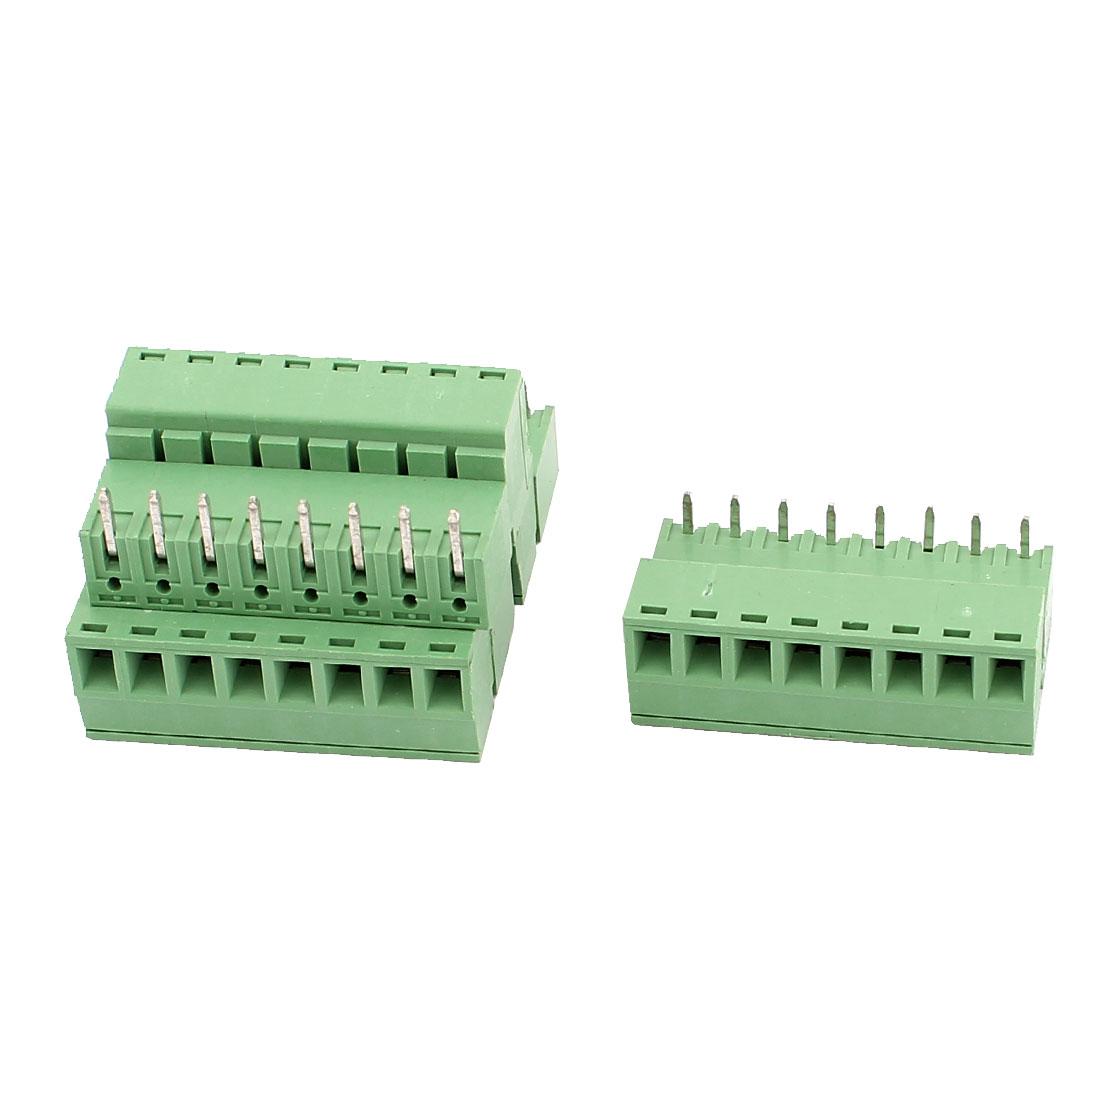 4 Pcs AC 300V 8A 8 Pins PCB Screw Terminal Block Connector 3.81mm Pitch Green